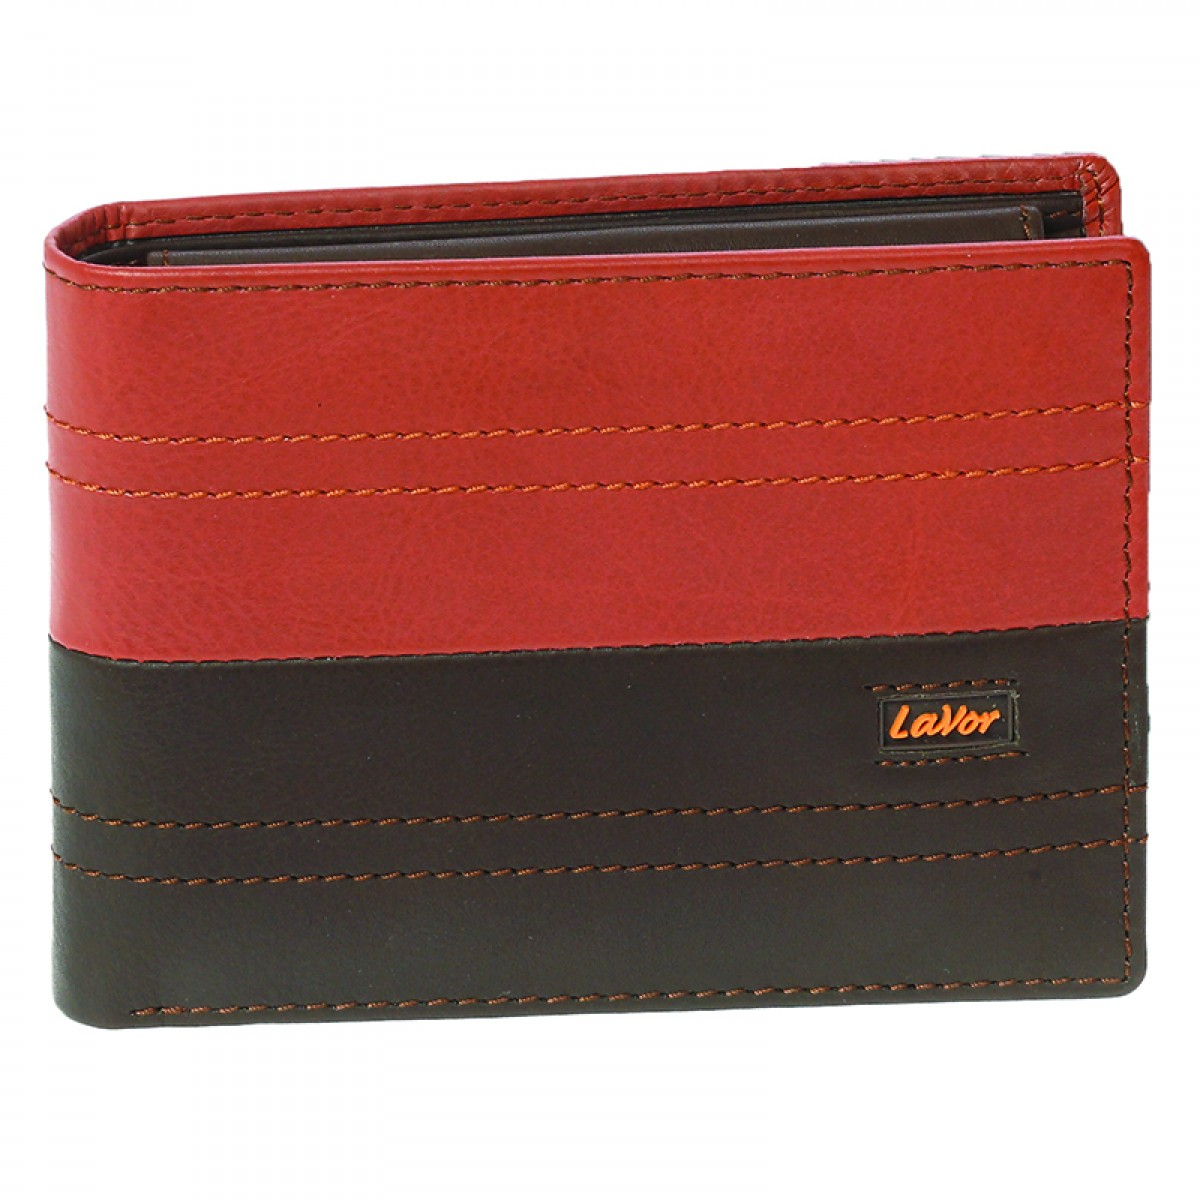 95dd265453 Δερμάτινο ανδρικό πορτοφόλι LAVOR 1-5854 σε καφέ χρώμα